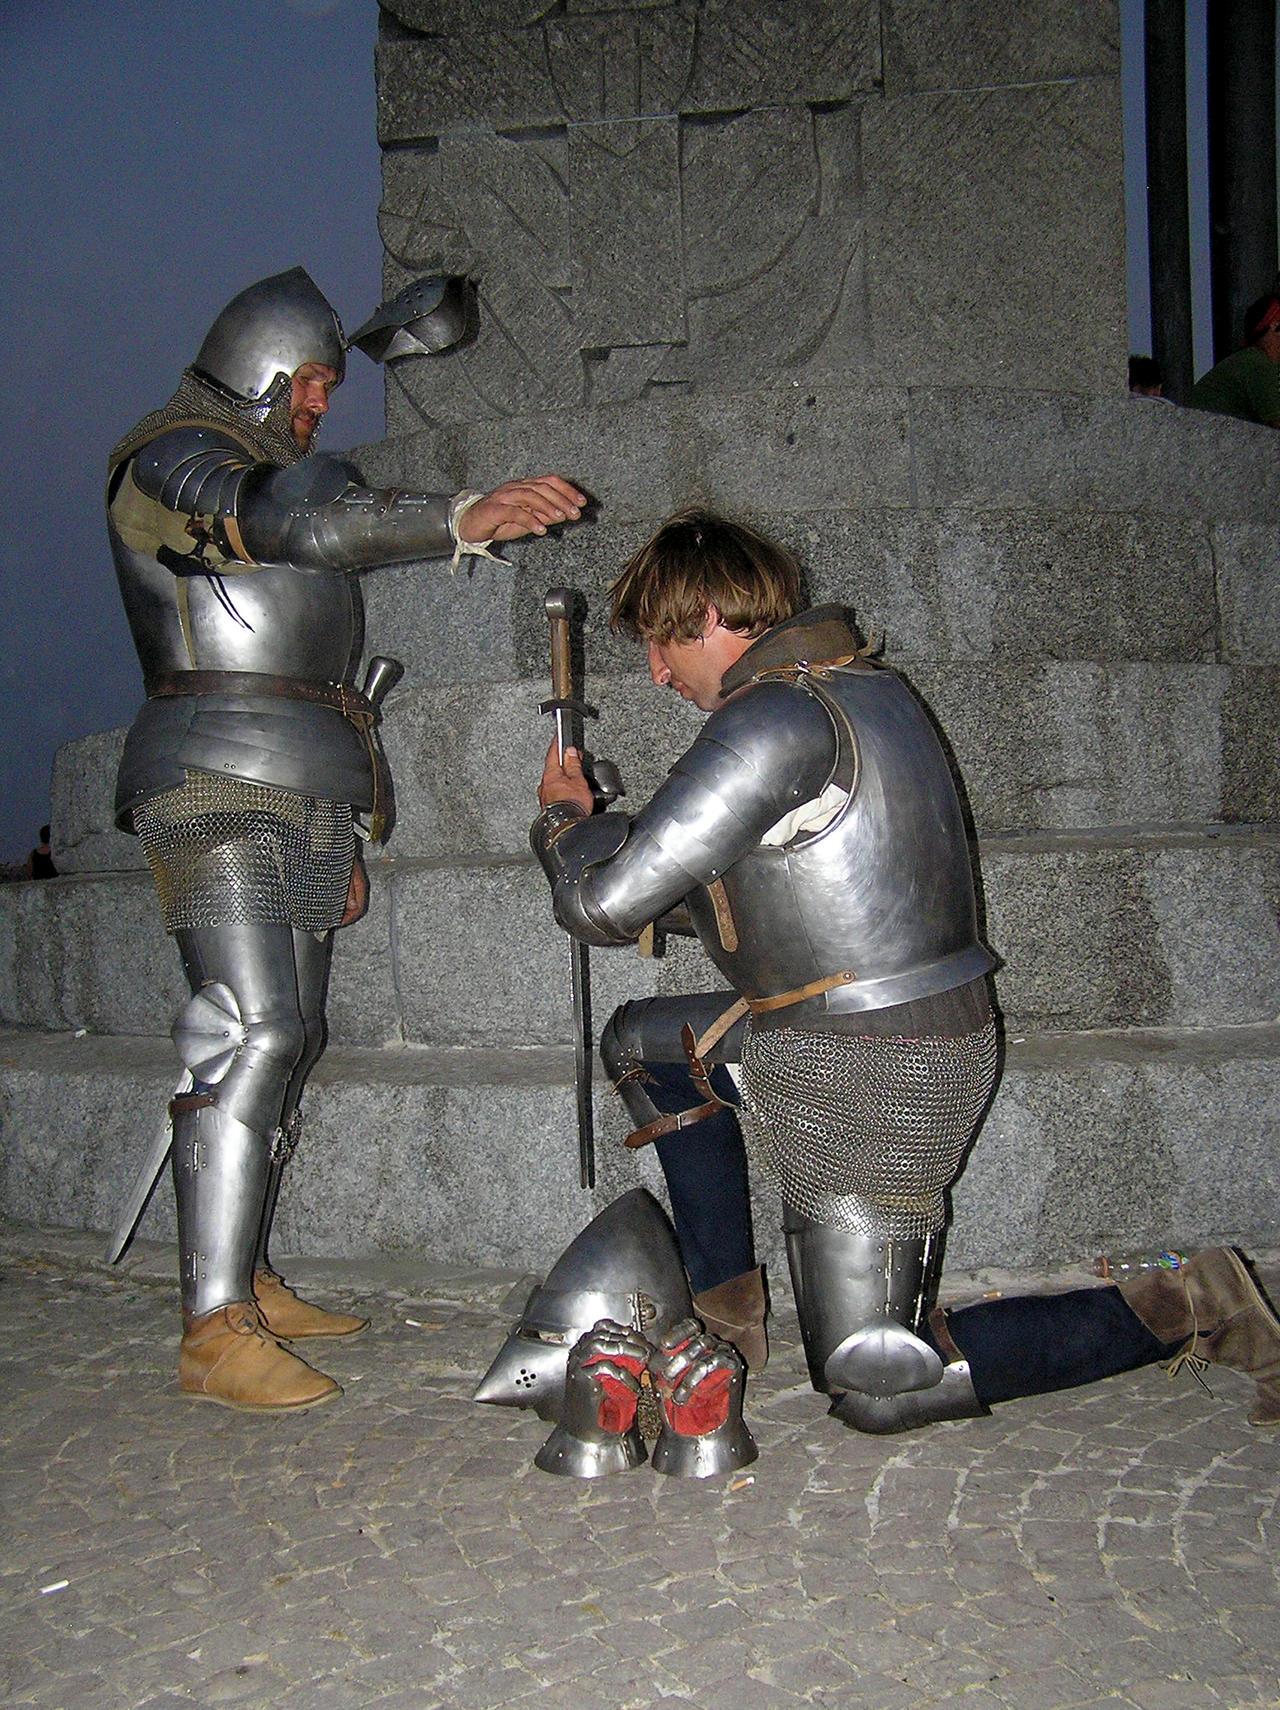 Рыцари приколы картинки, картинки поздравлениями